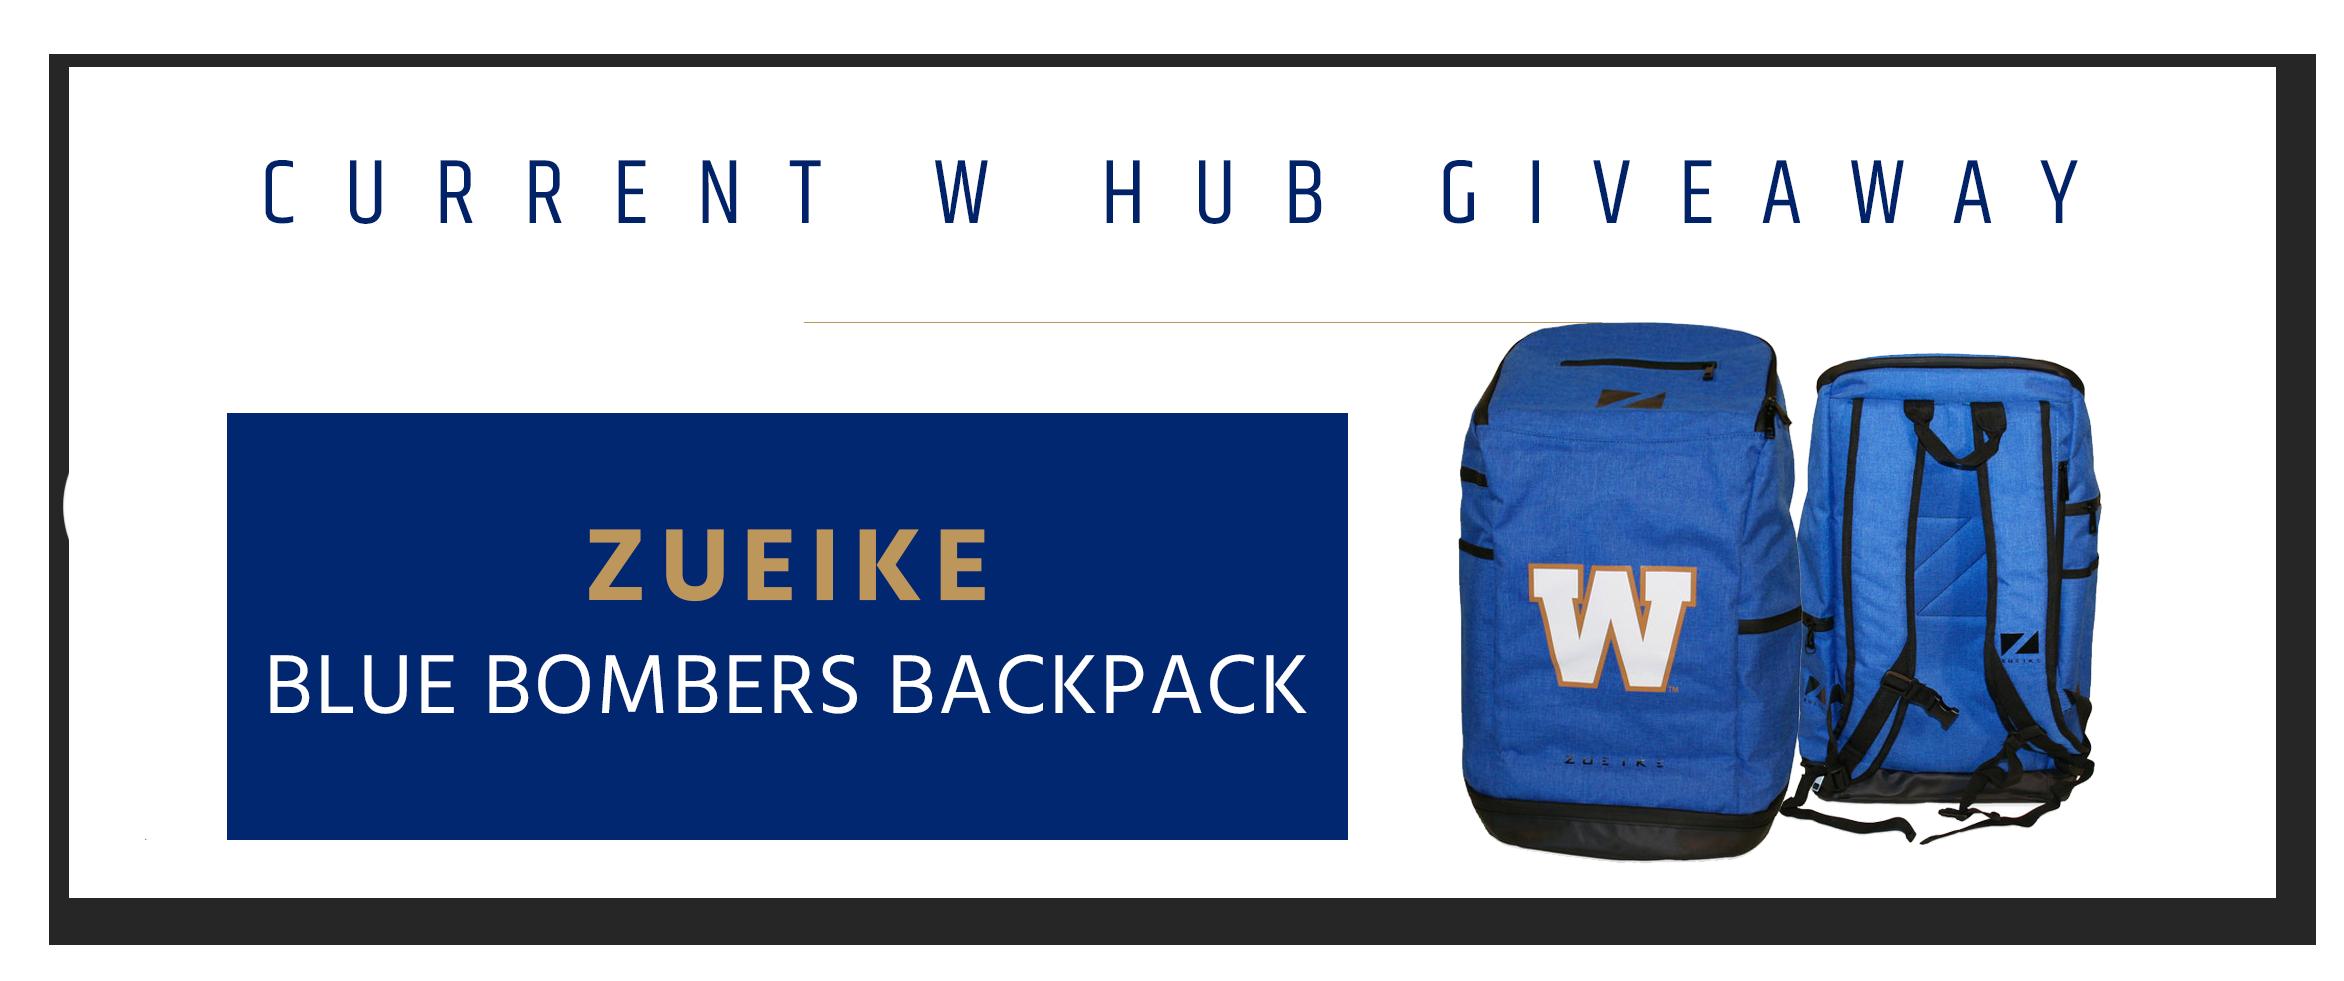 Monthly Giveaway - Zuieke Backpack